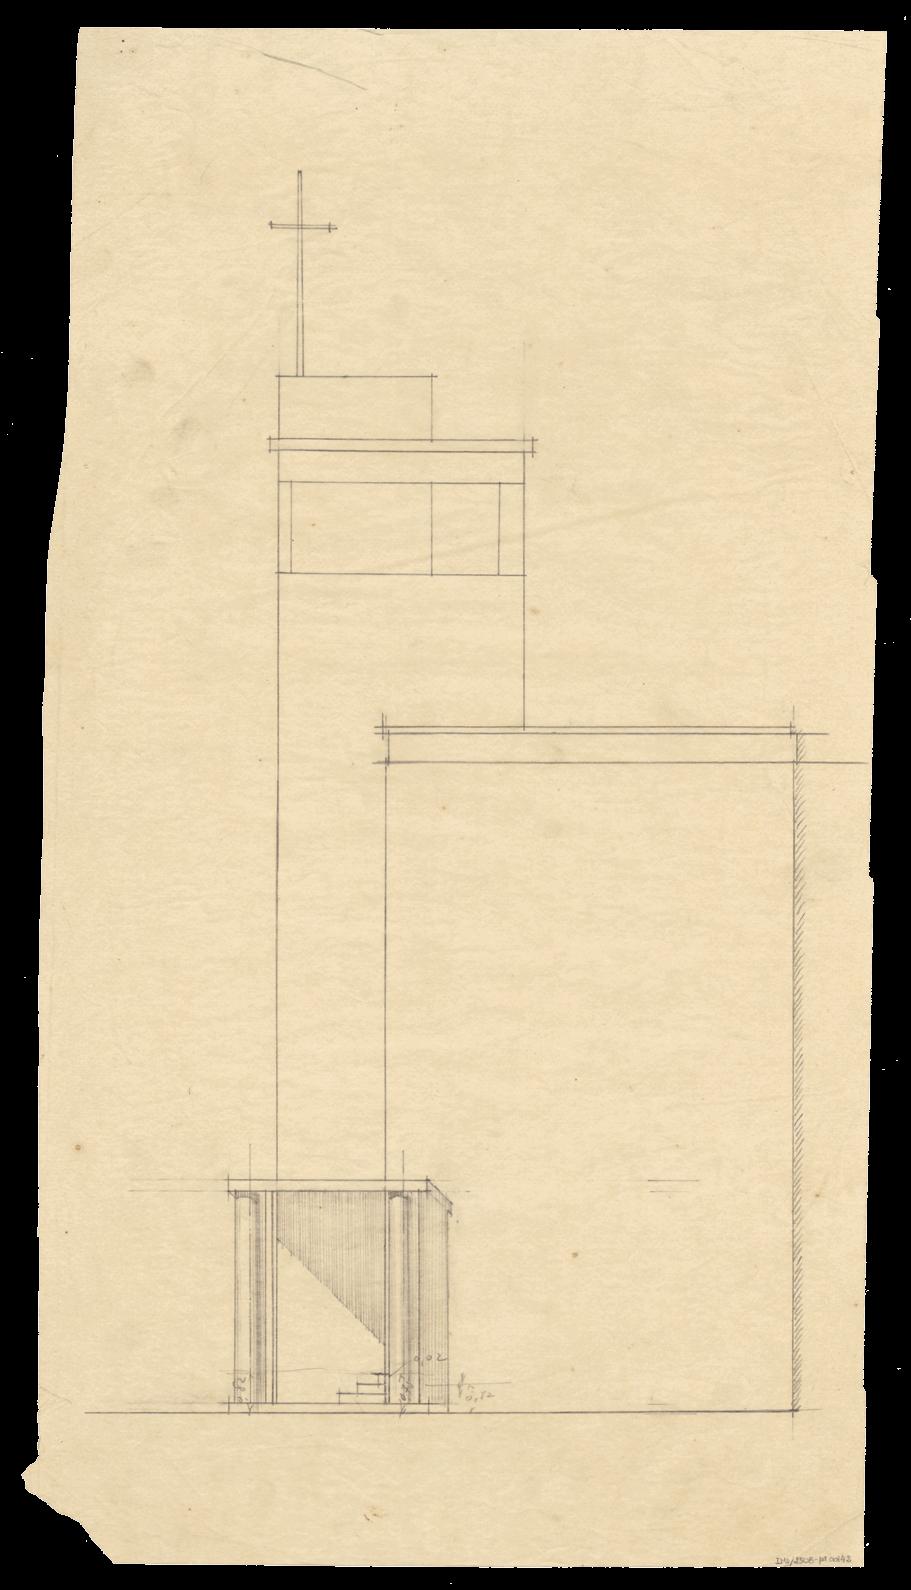 José Marques da Silva, Estudo de alçado, Casa de Serralves, Porto, 1931